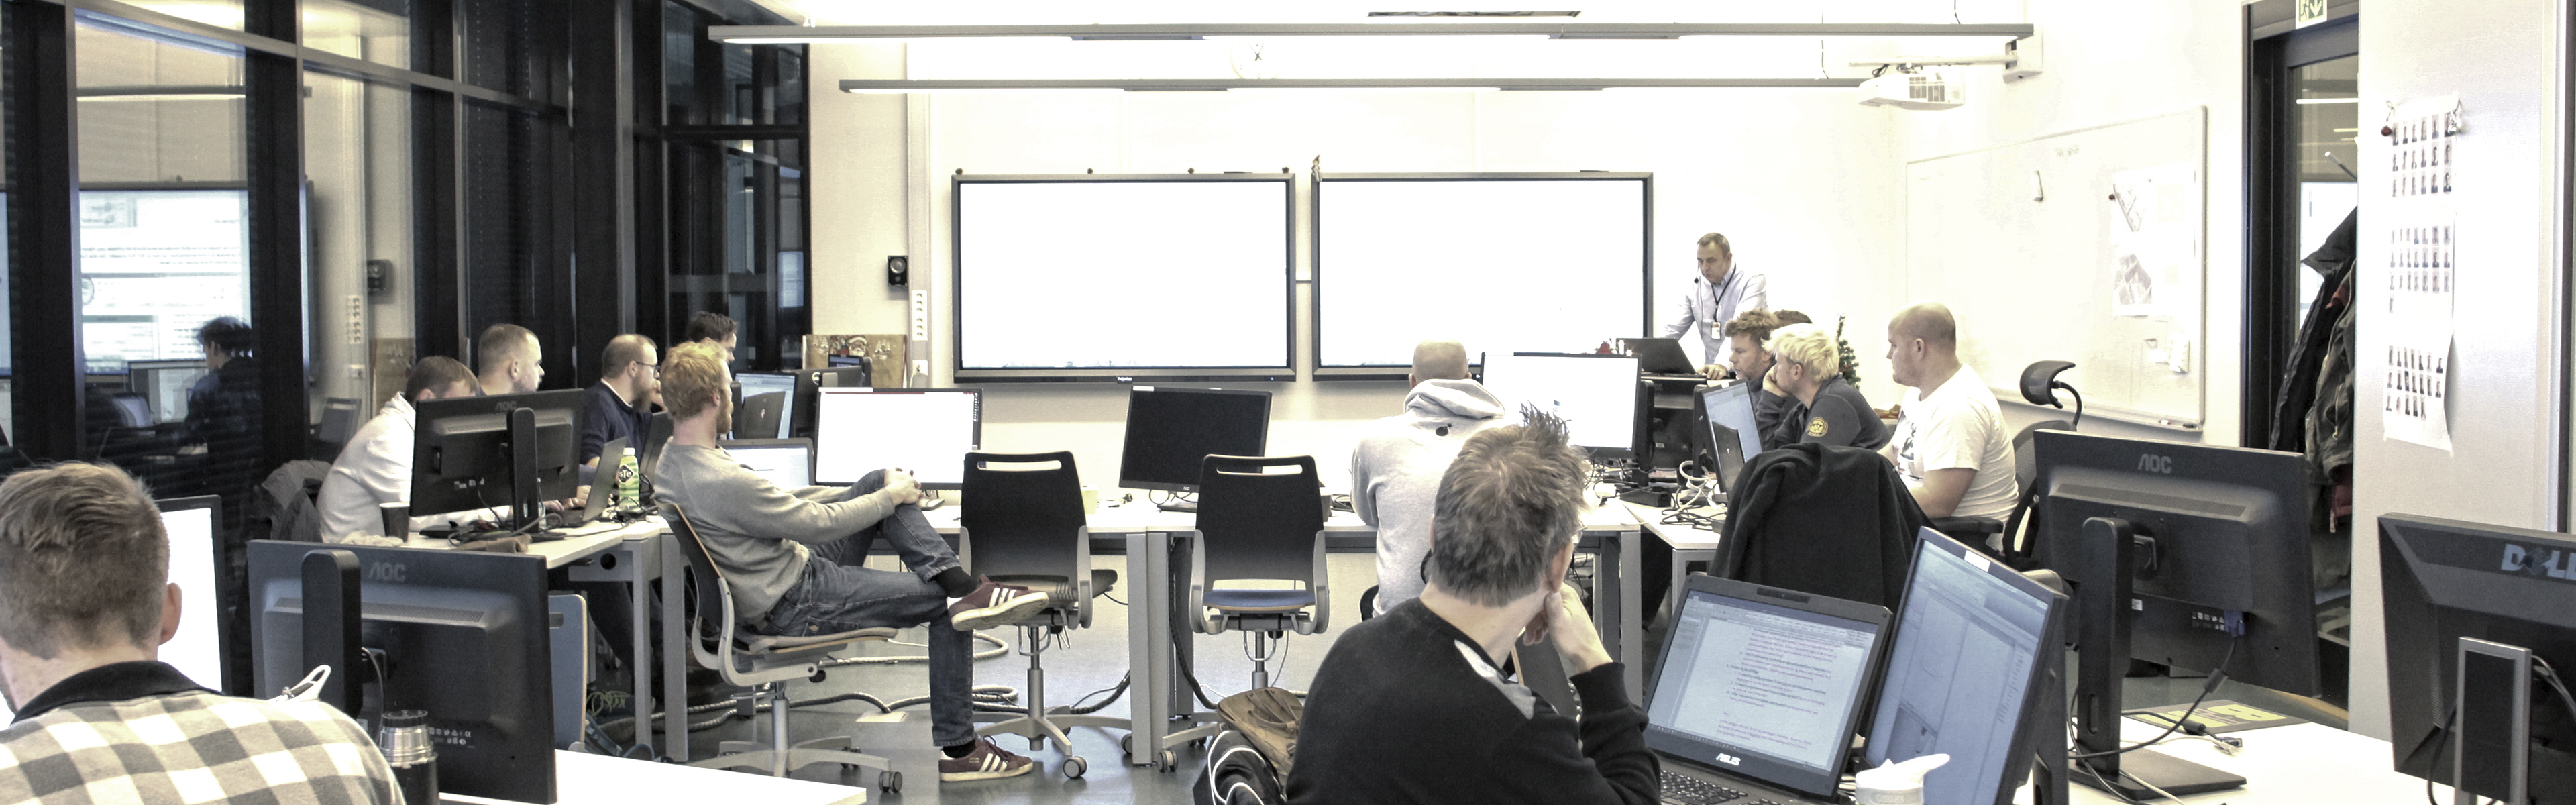 Header Interactive Norway Prowise BIM Fagskolen i Oslo og Akershus Kuben